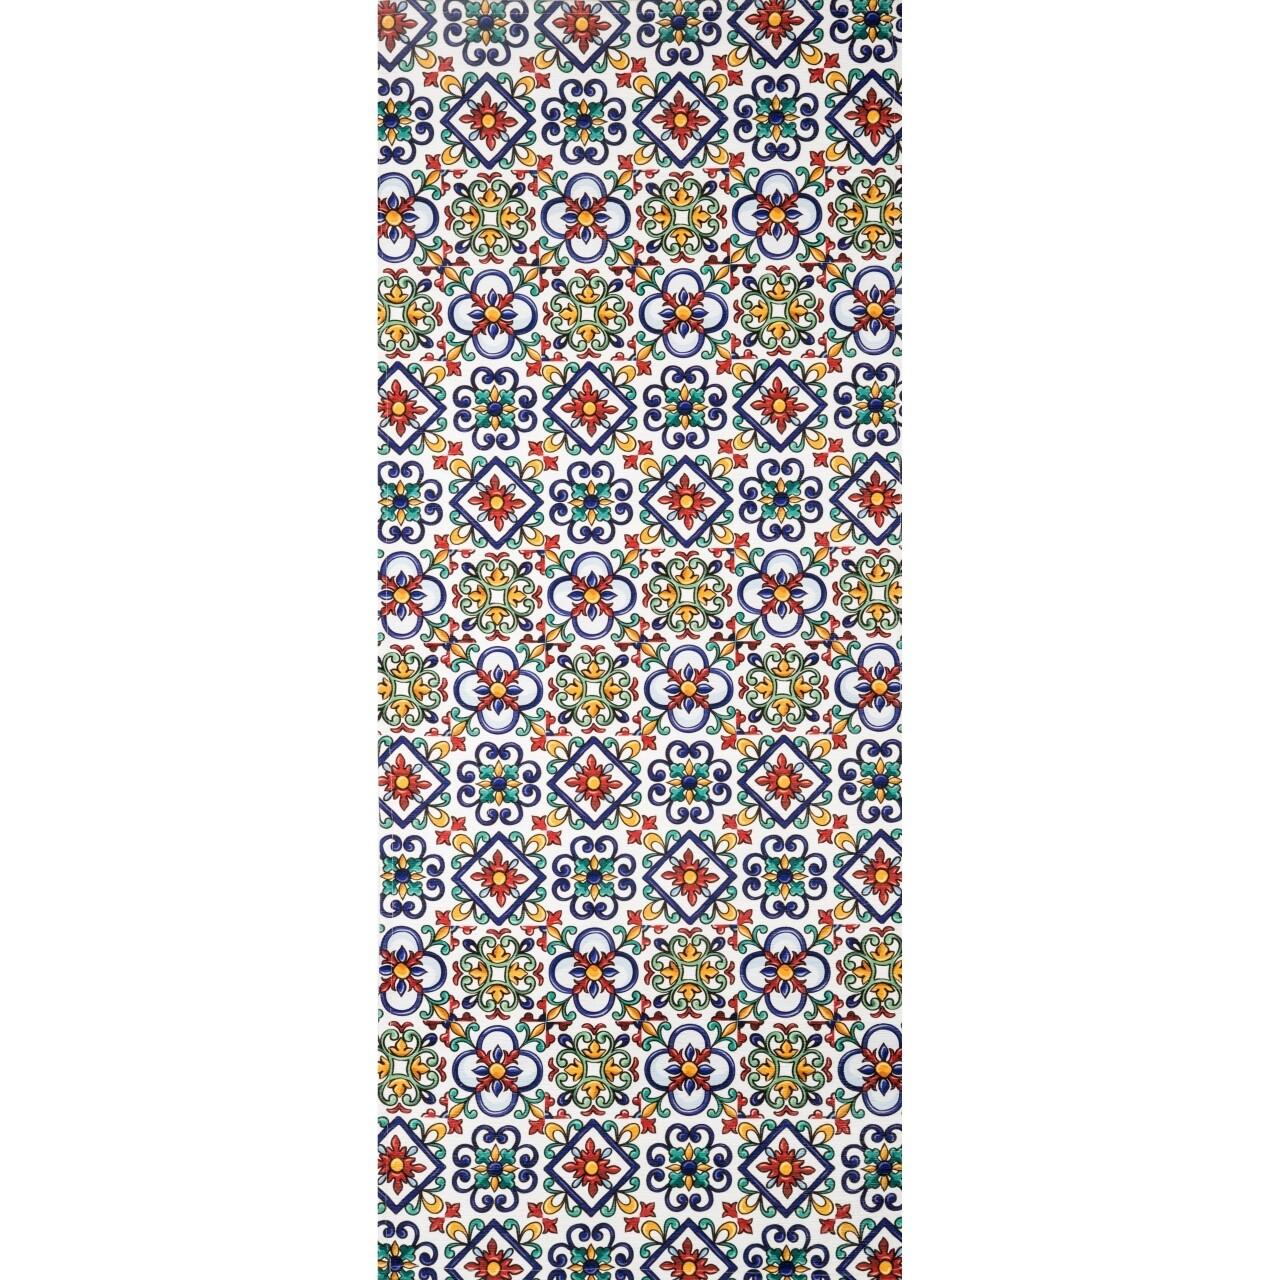 Covor rezistent Webtappeti CERAMICA1 CM 58x140 cm, multicolor